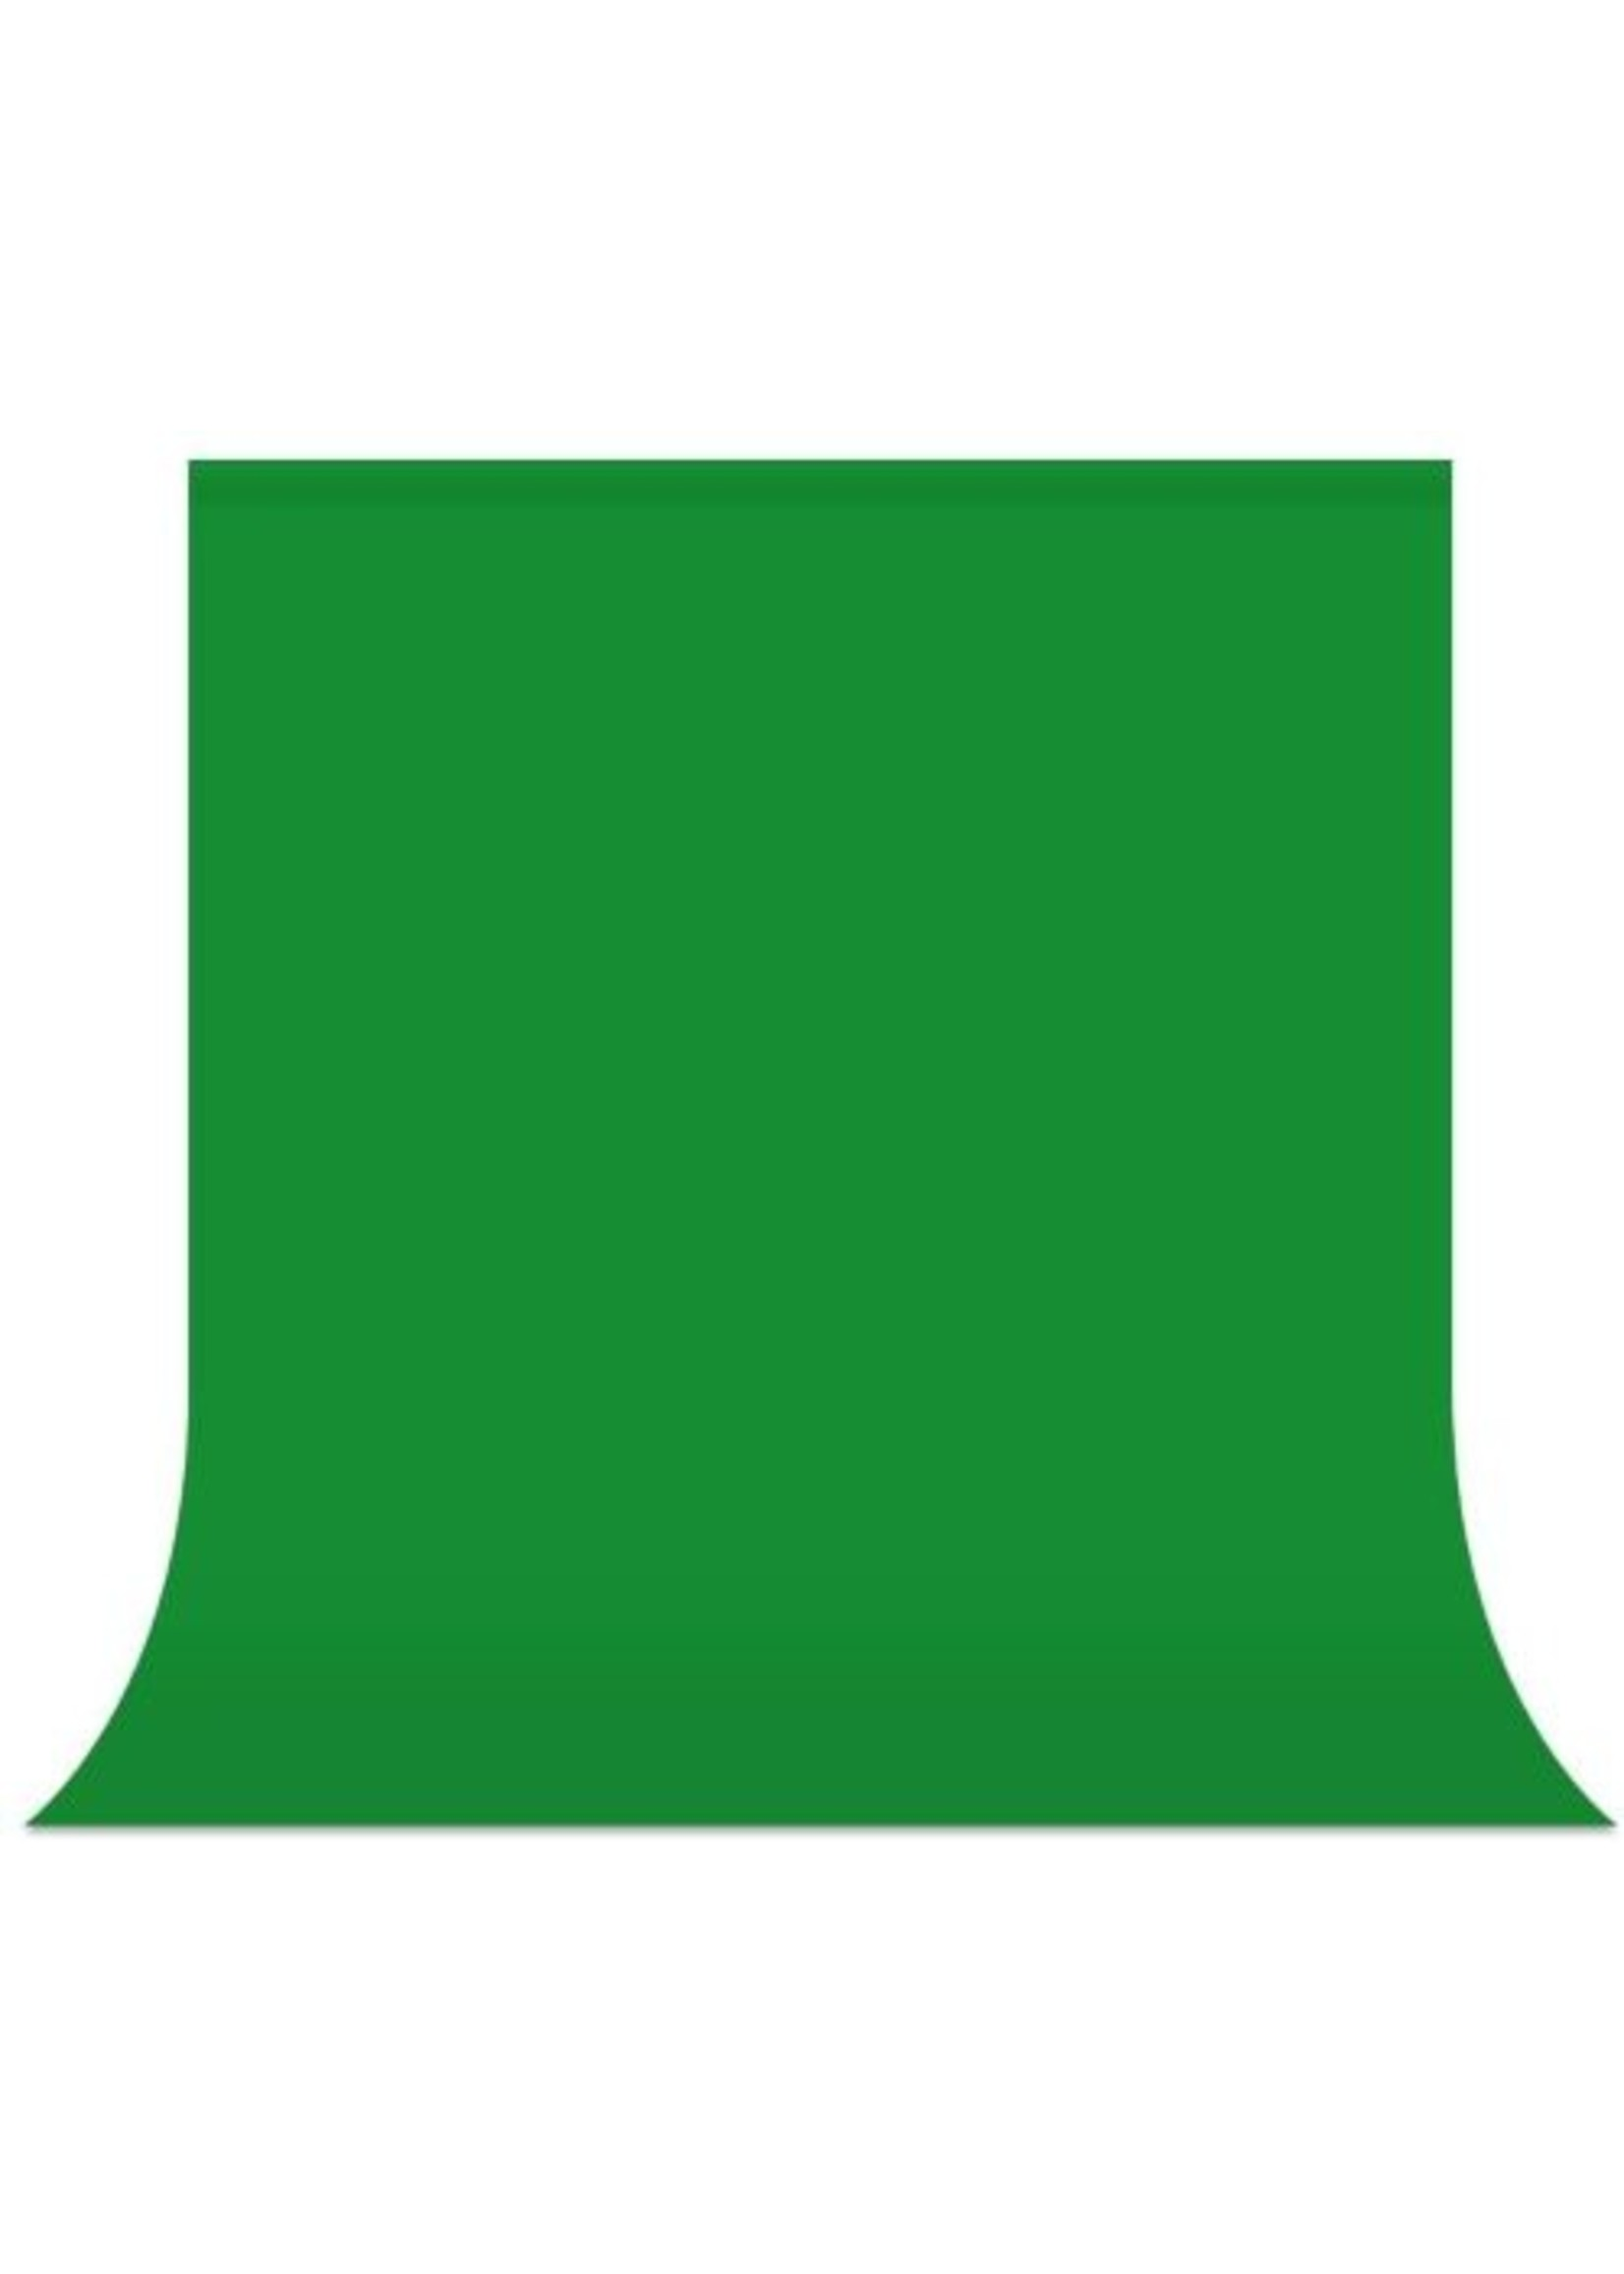 5x7 FT Green Screen Key Backdrop